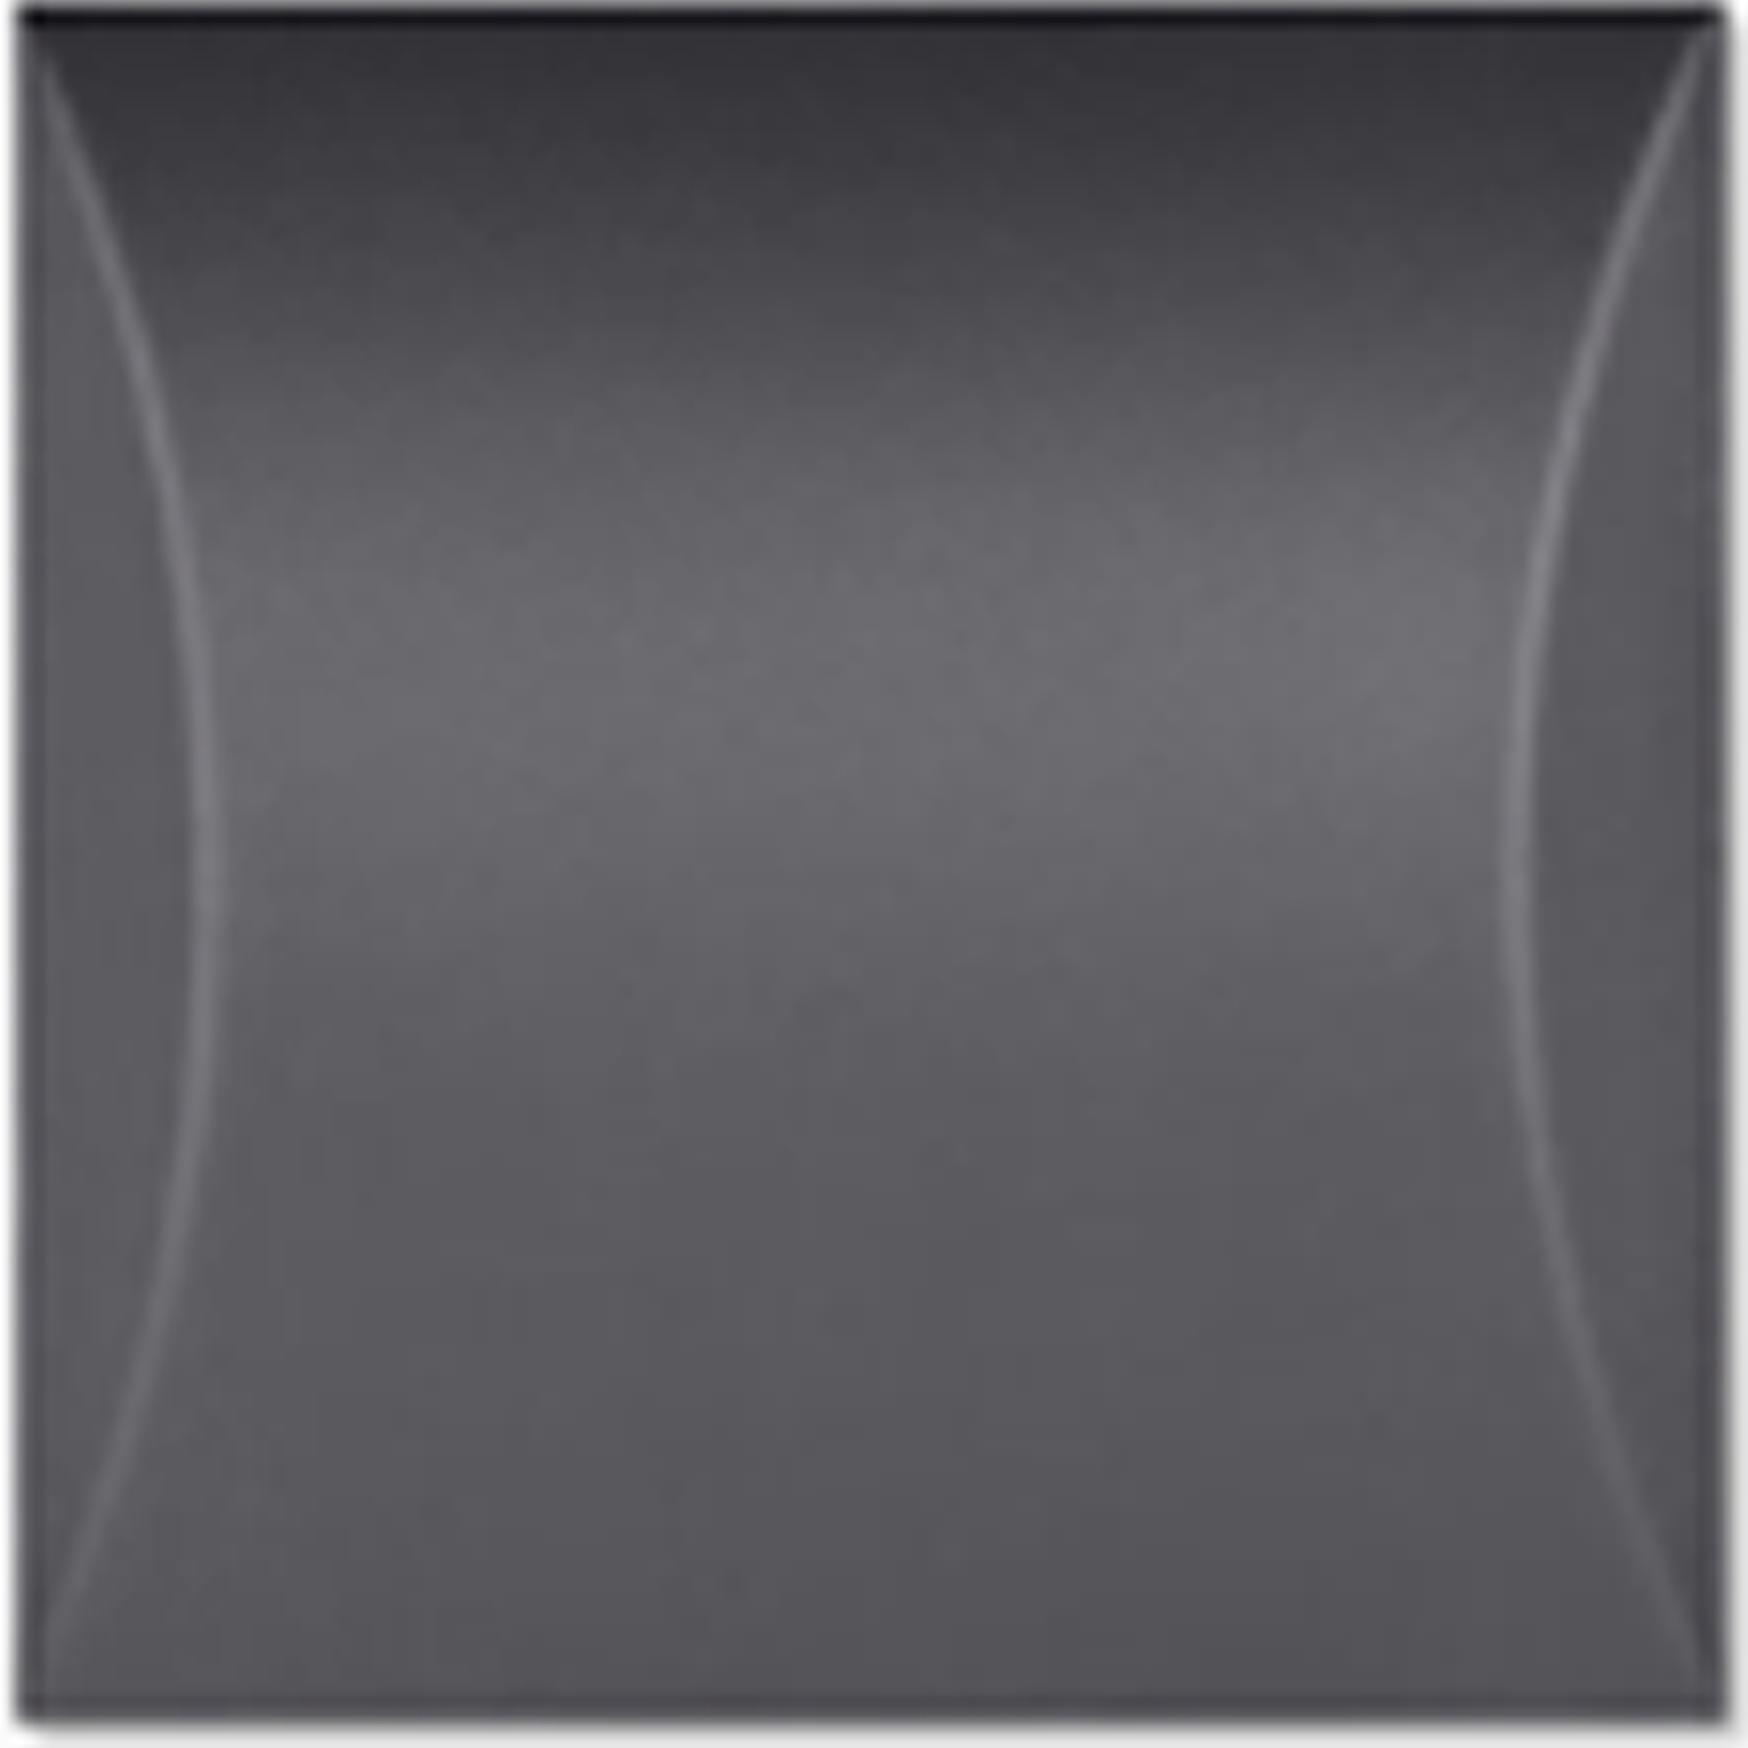 Bend Antracita 14.8x14.8 cm